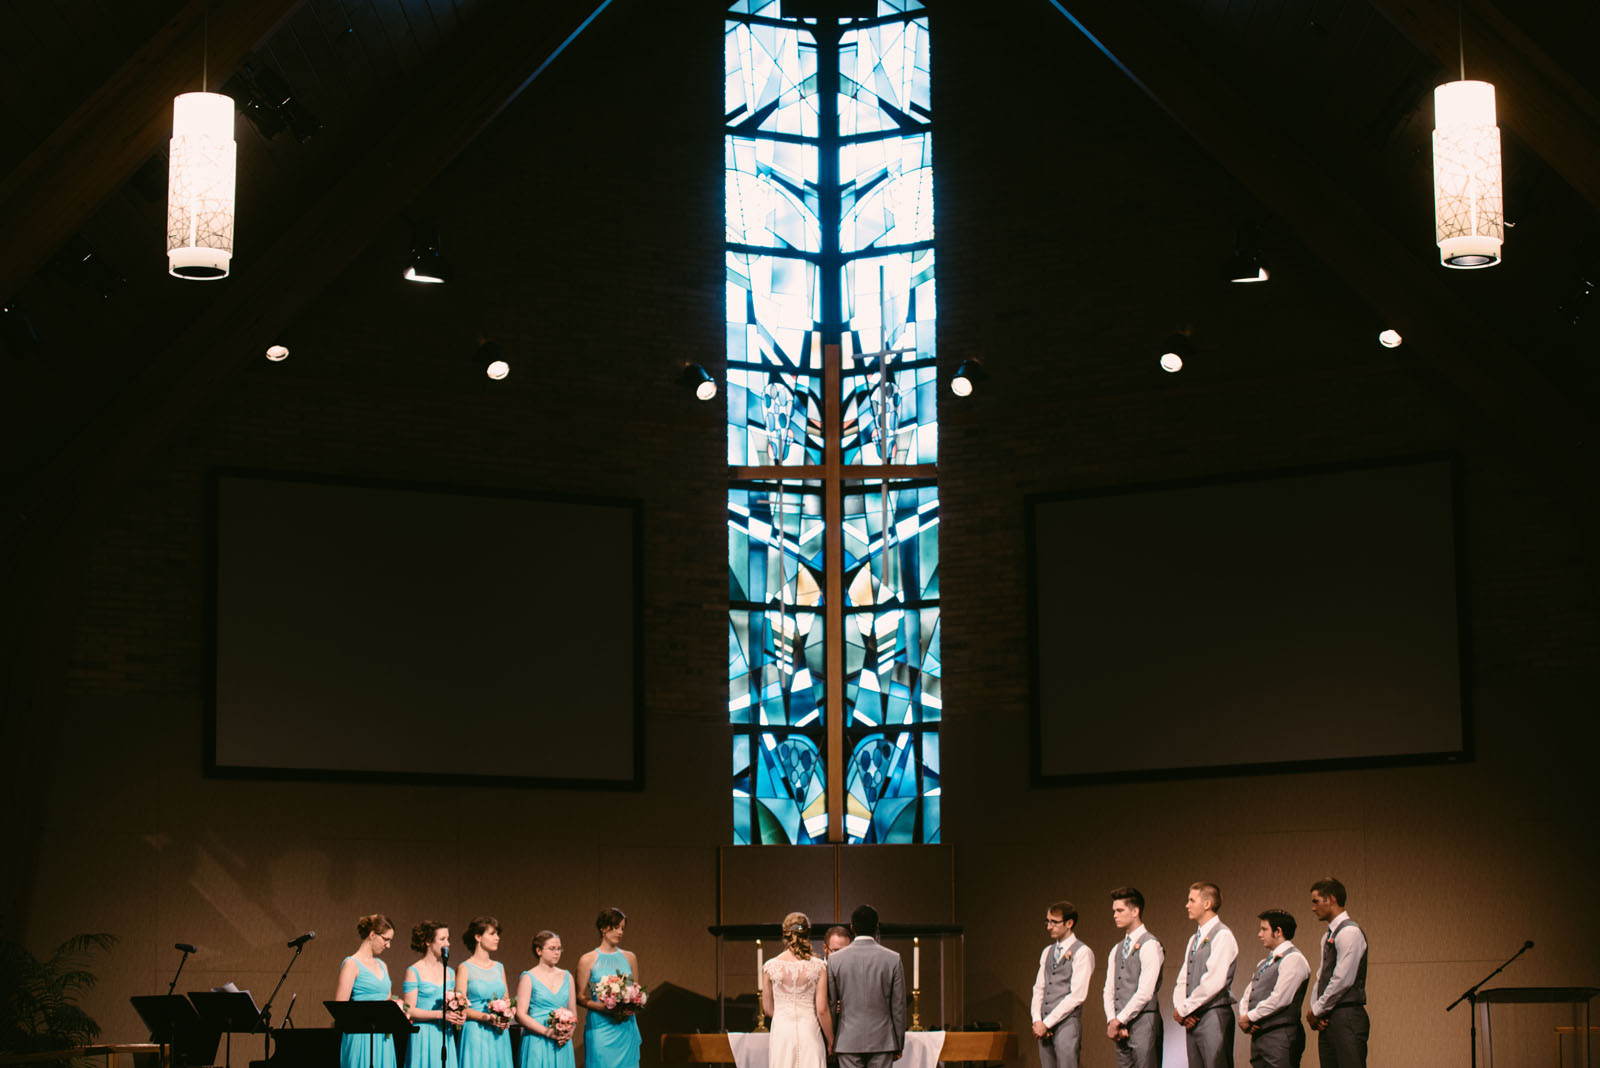 emotional-wedding-ceremony-photographer.jpg